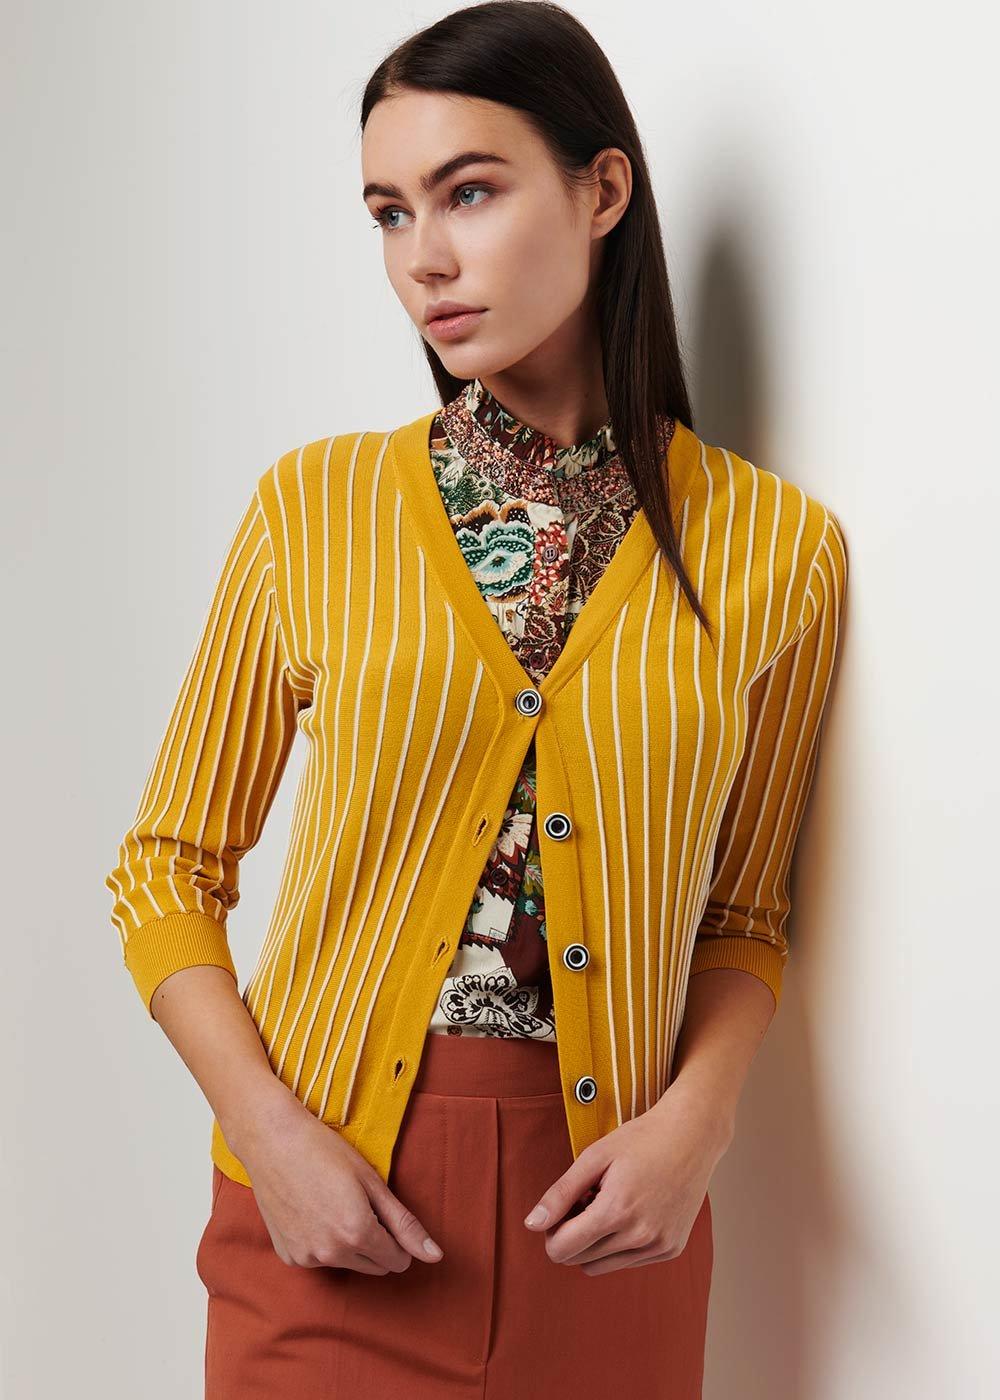 Clio striped cardigan - Sole \ White Stripes - Woman